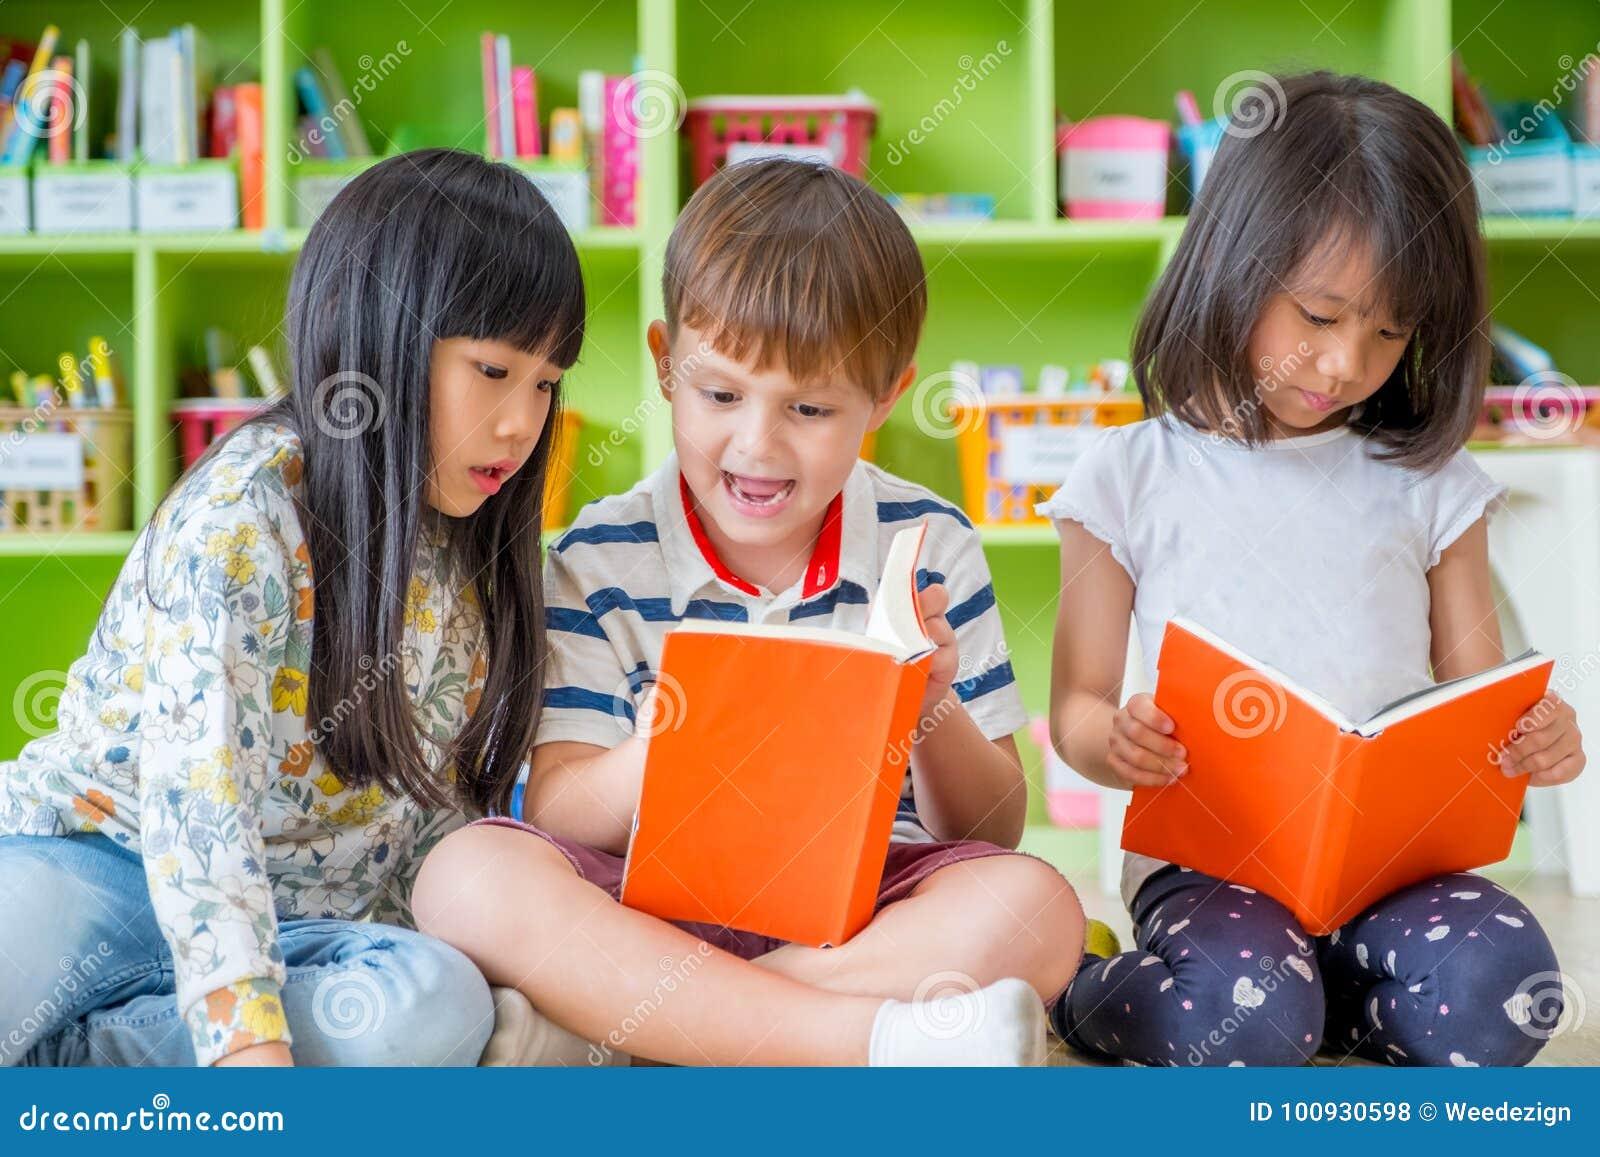 Children sitting on floor and reading tale book in preschool li